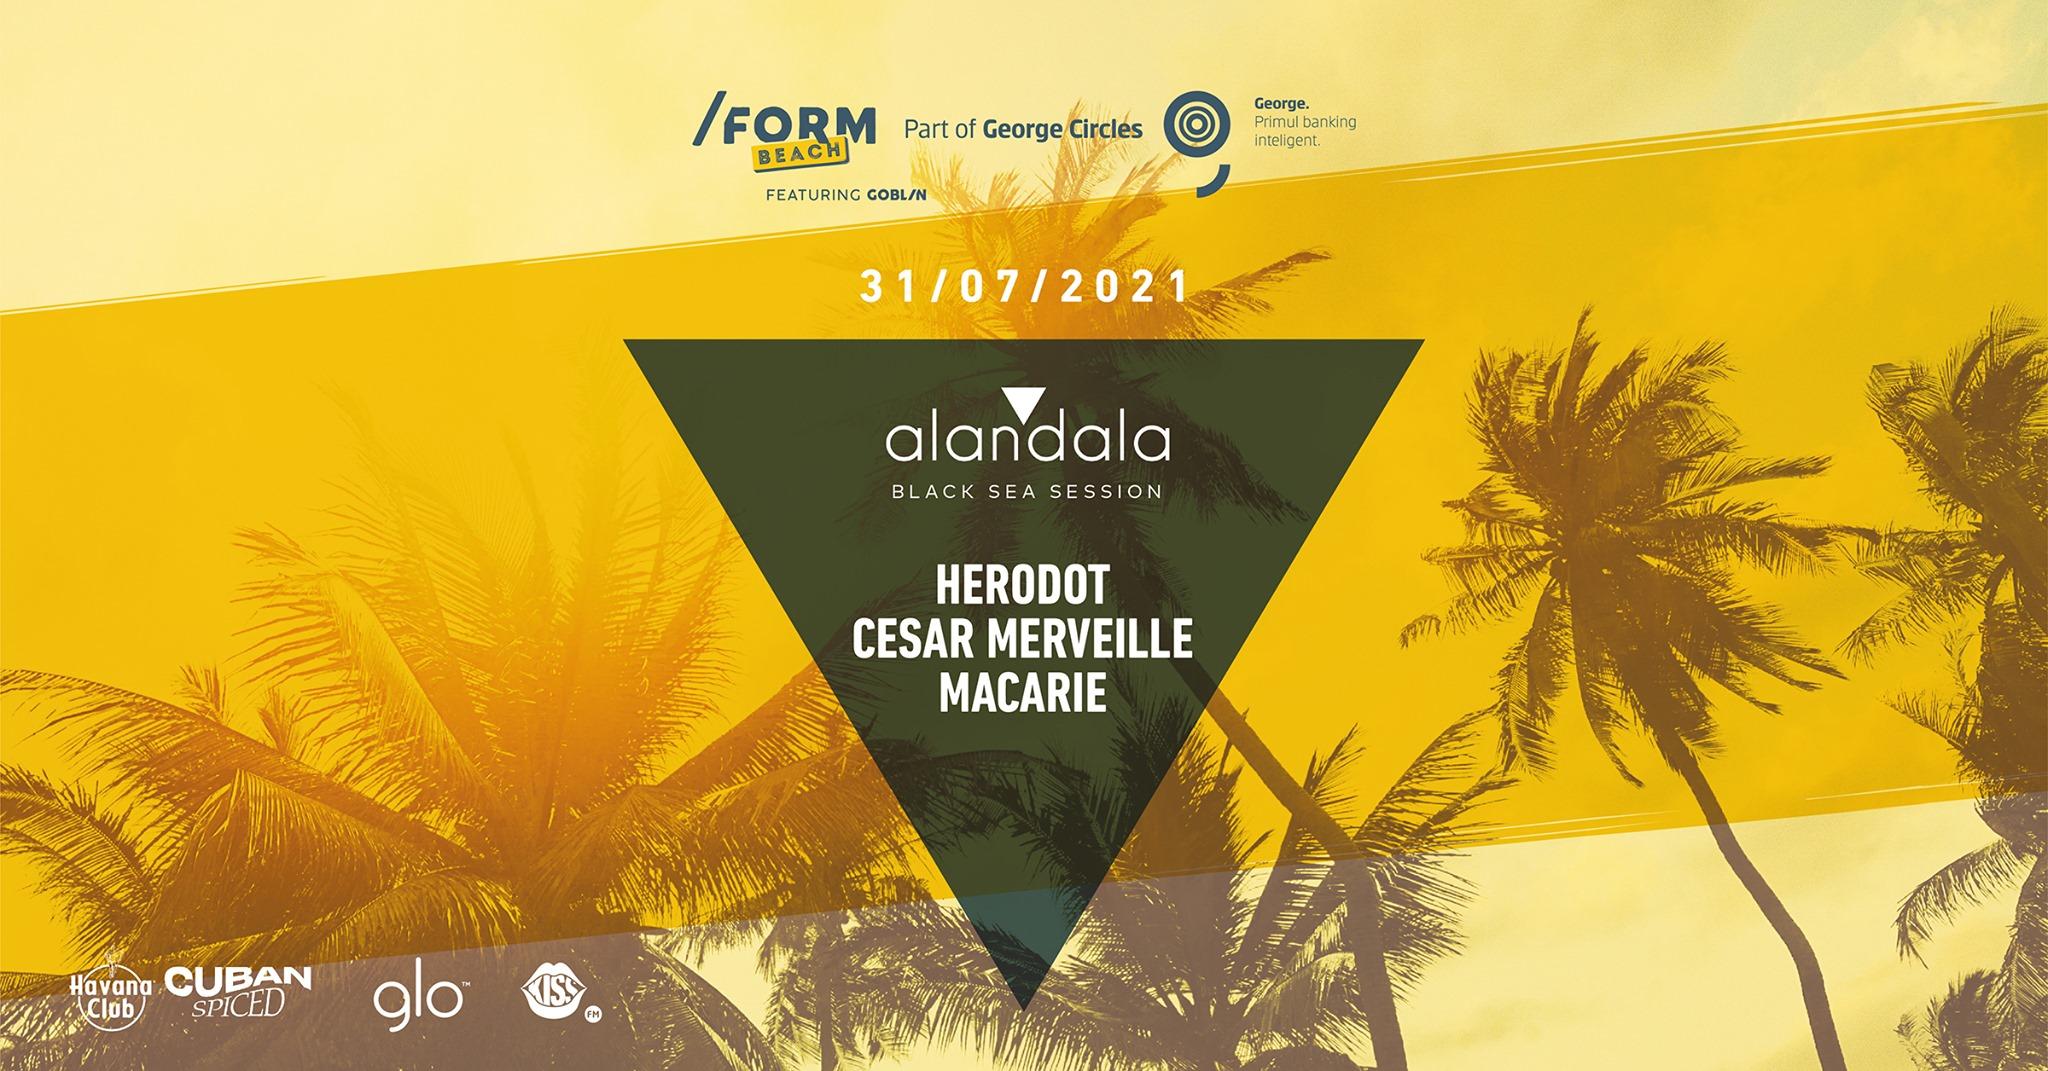 Alandala Herodot, Cesar Merveille, Macarie at /FORM Beach